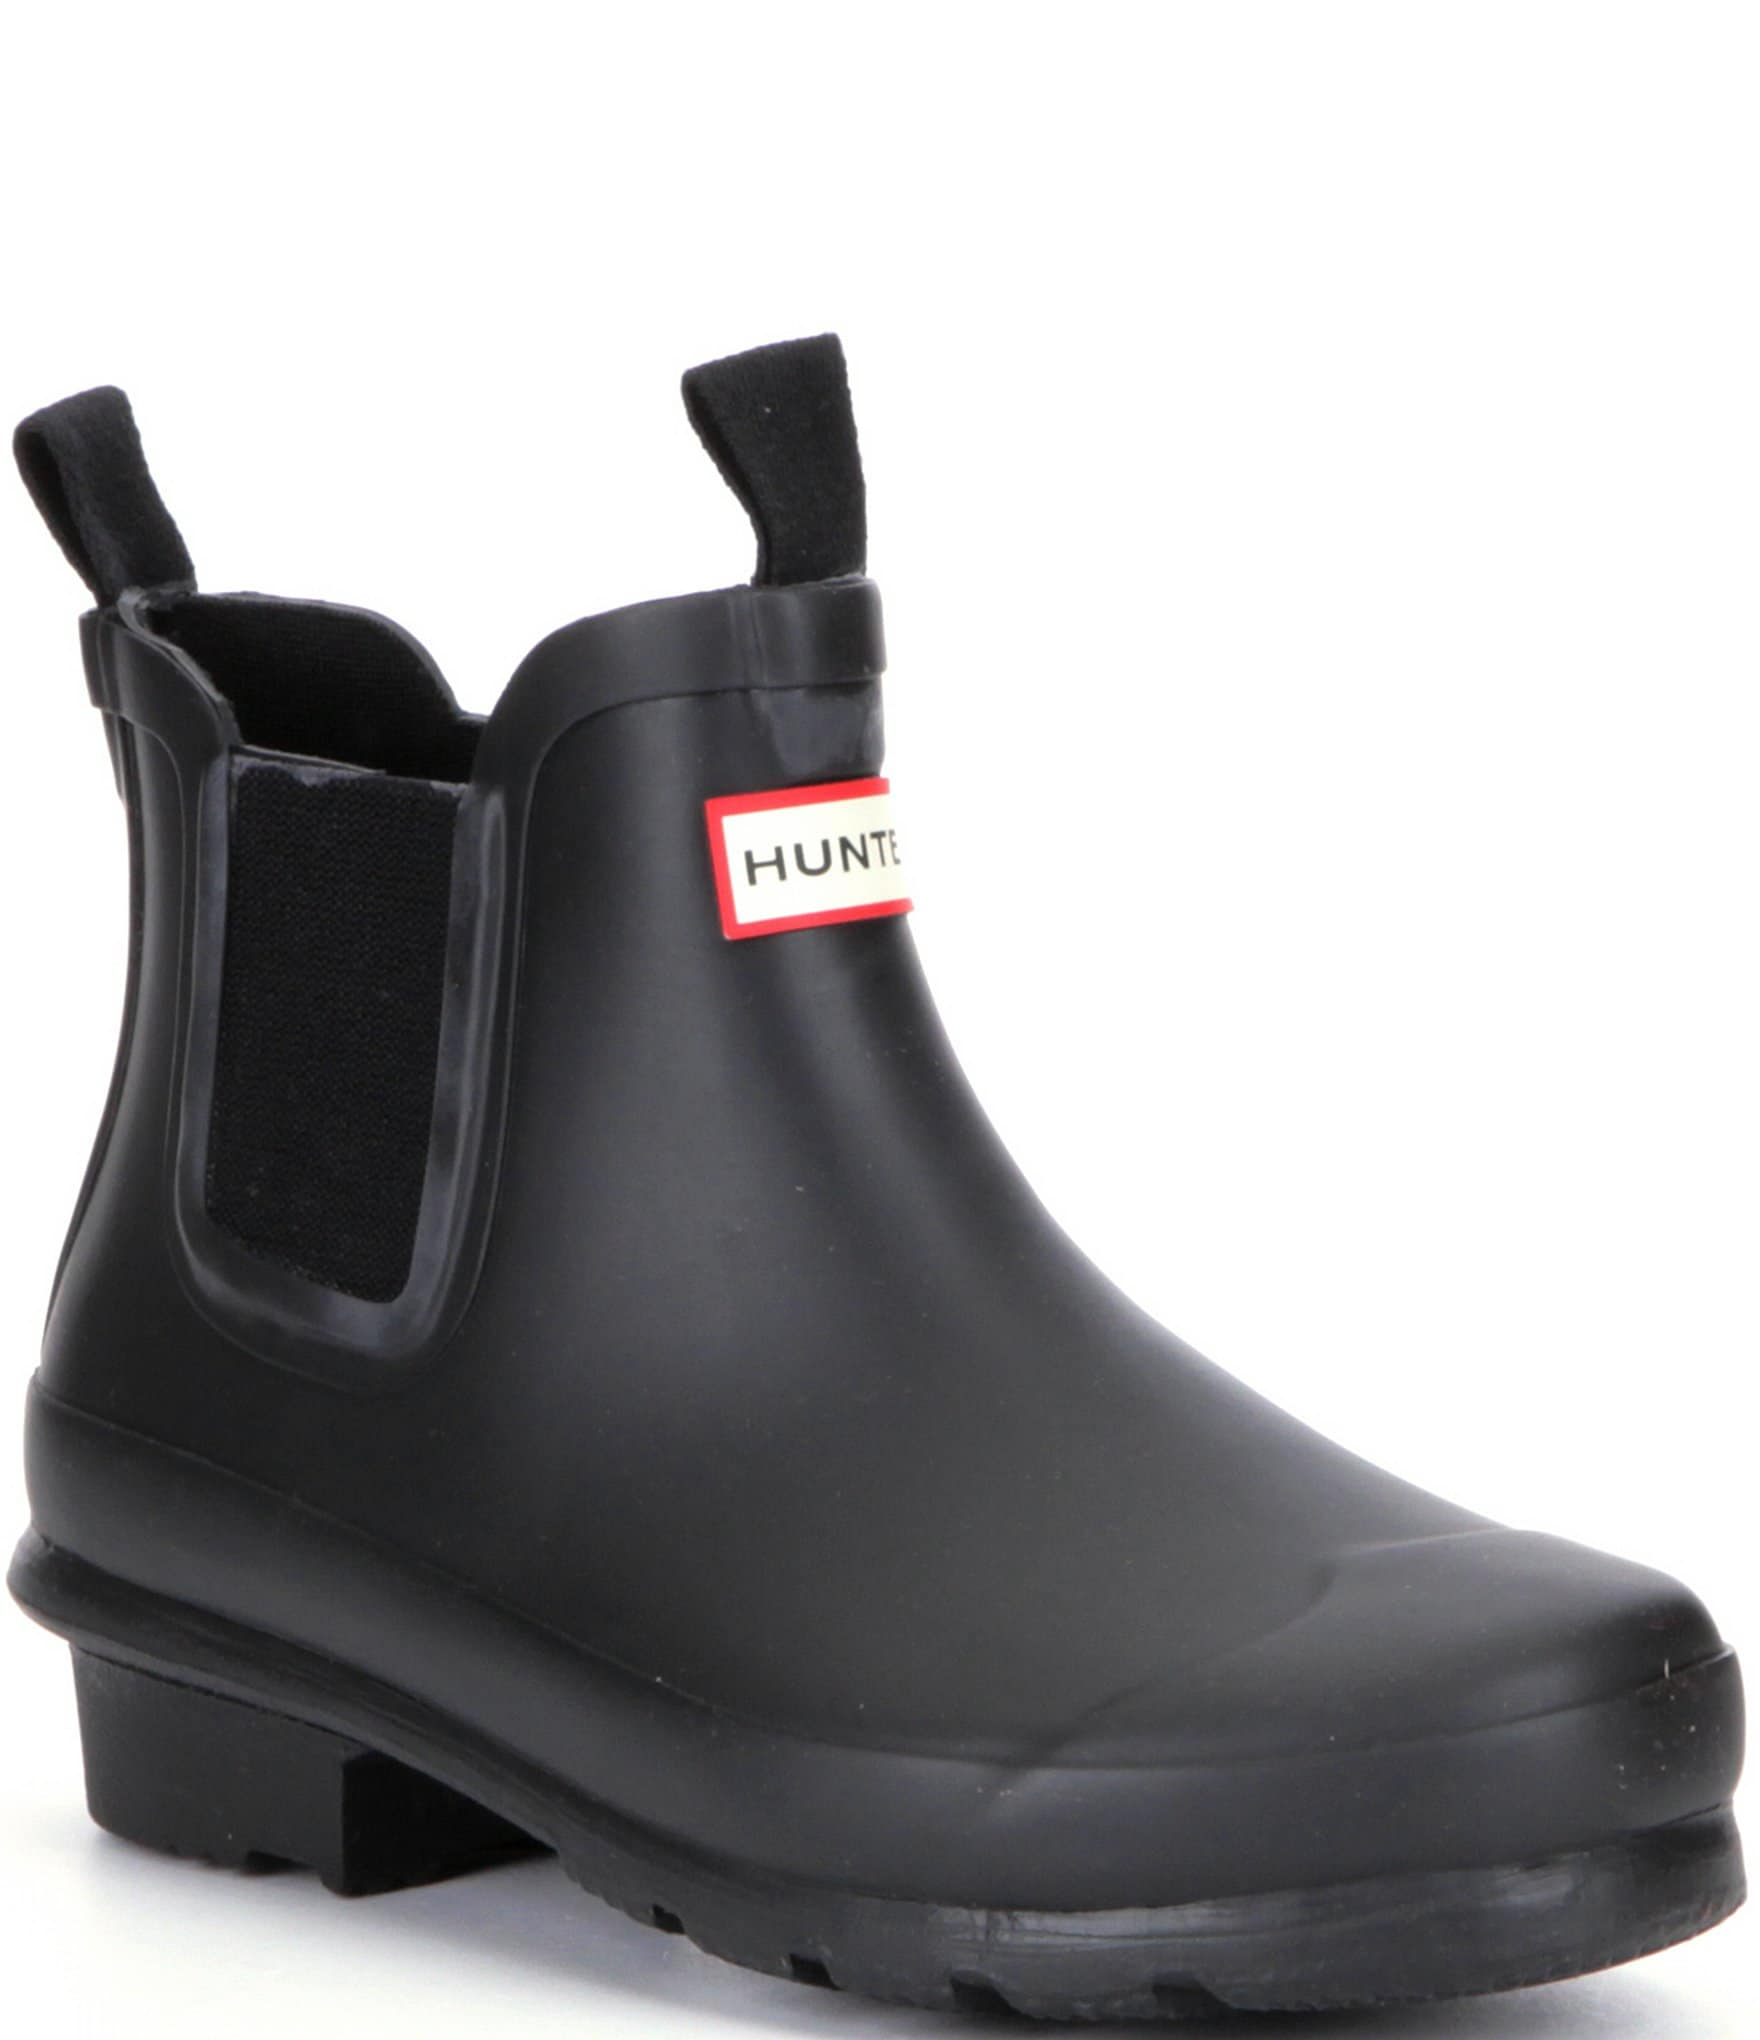 new lifestyle 2019 discount sale release info on Hunter Original Kids' Chelsea Waterproof Rain Boots